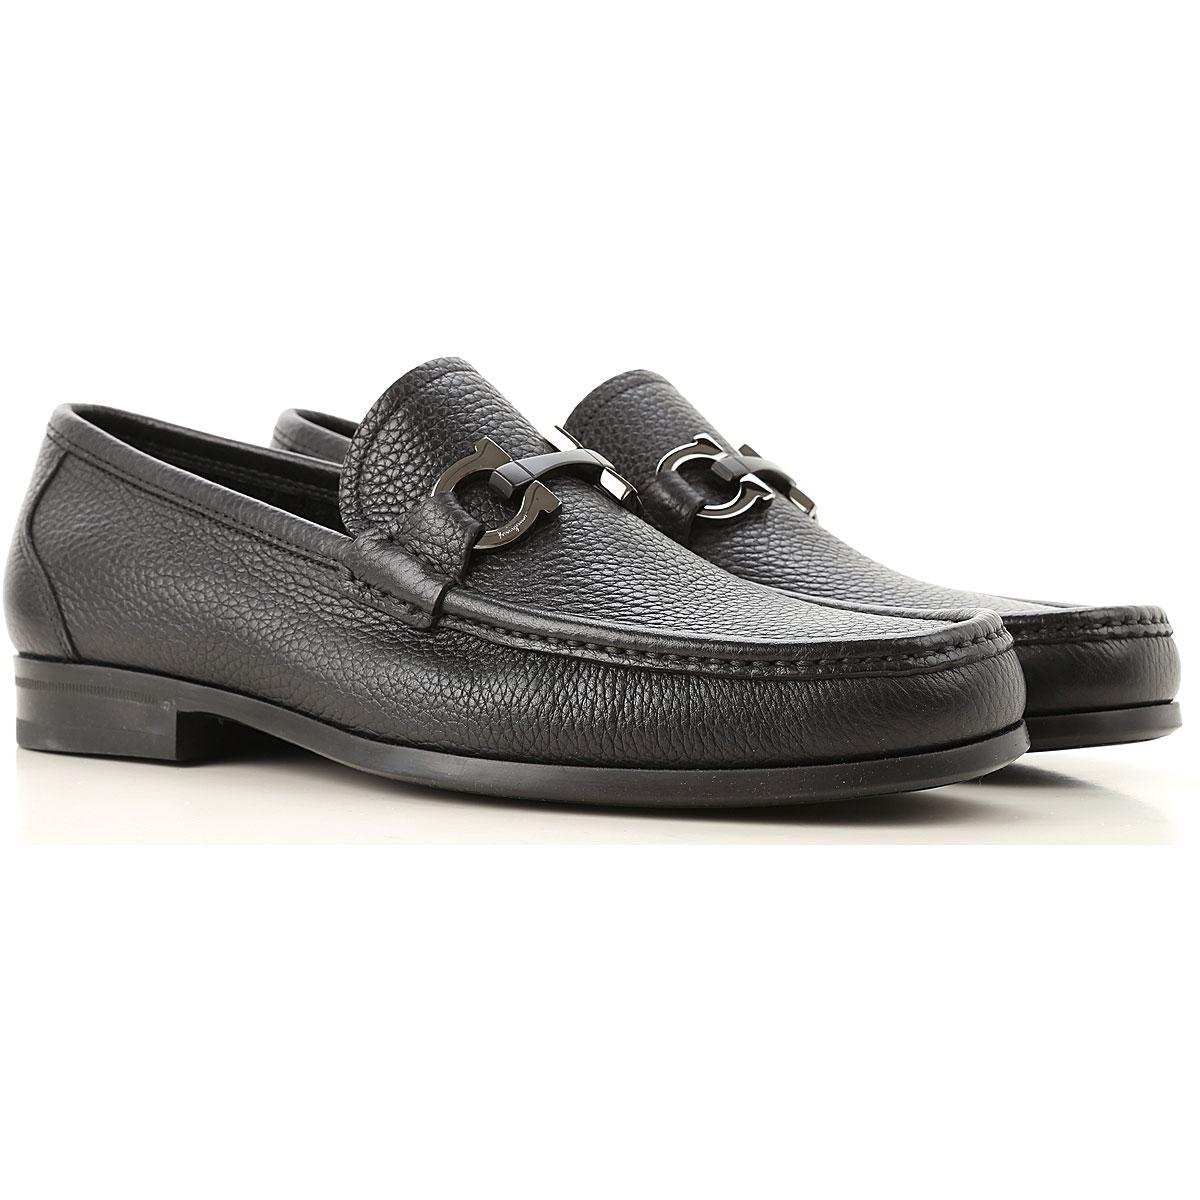 Salvatore Ferragamo Loafers for Men On Sale, Black, Crackle Leather, 2019, 6 6.5 7 7.5 8 8.5 9 9.5